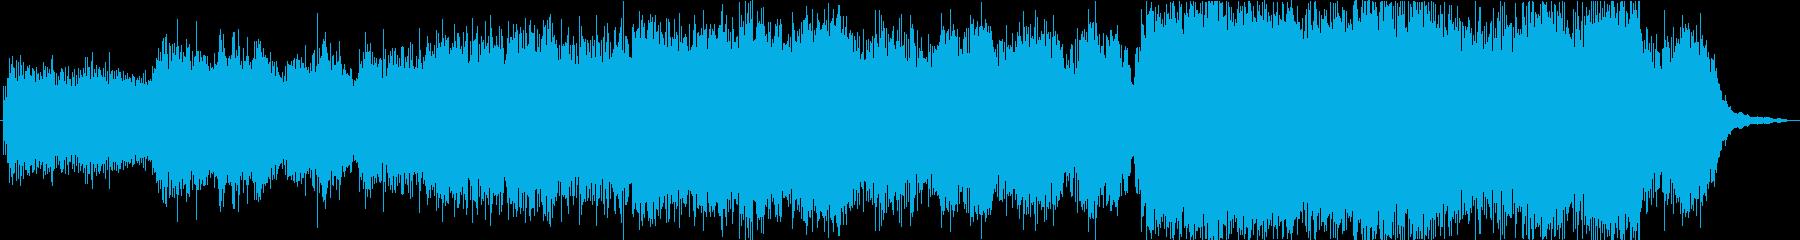 Wind Flowの再生済みの波形